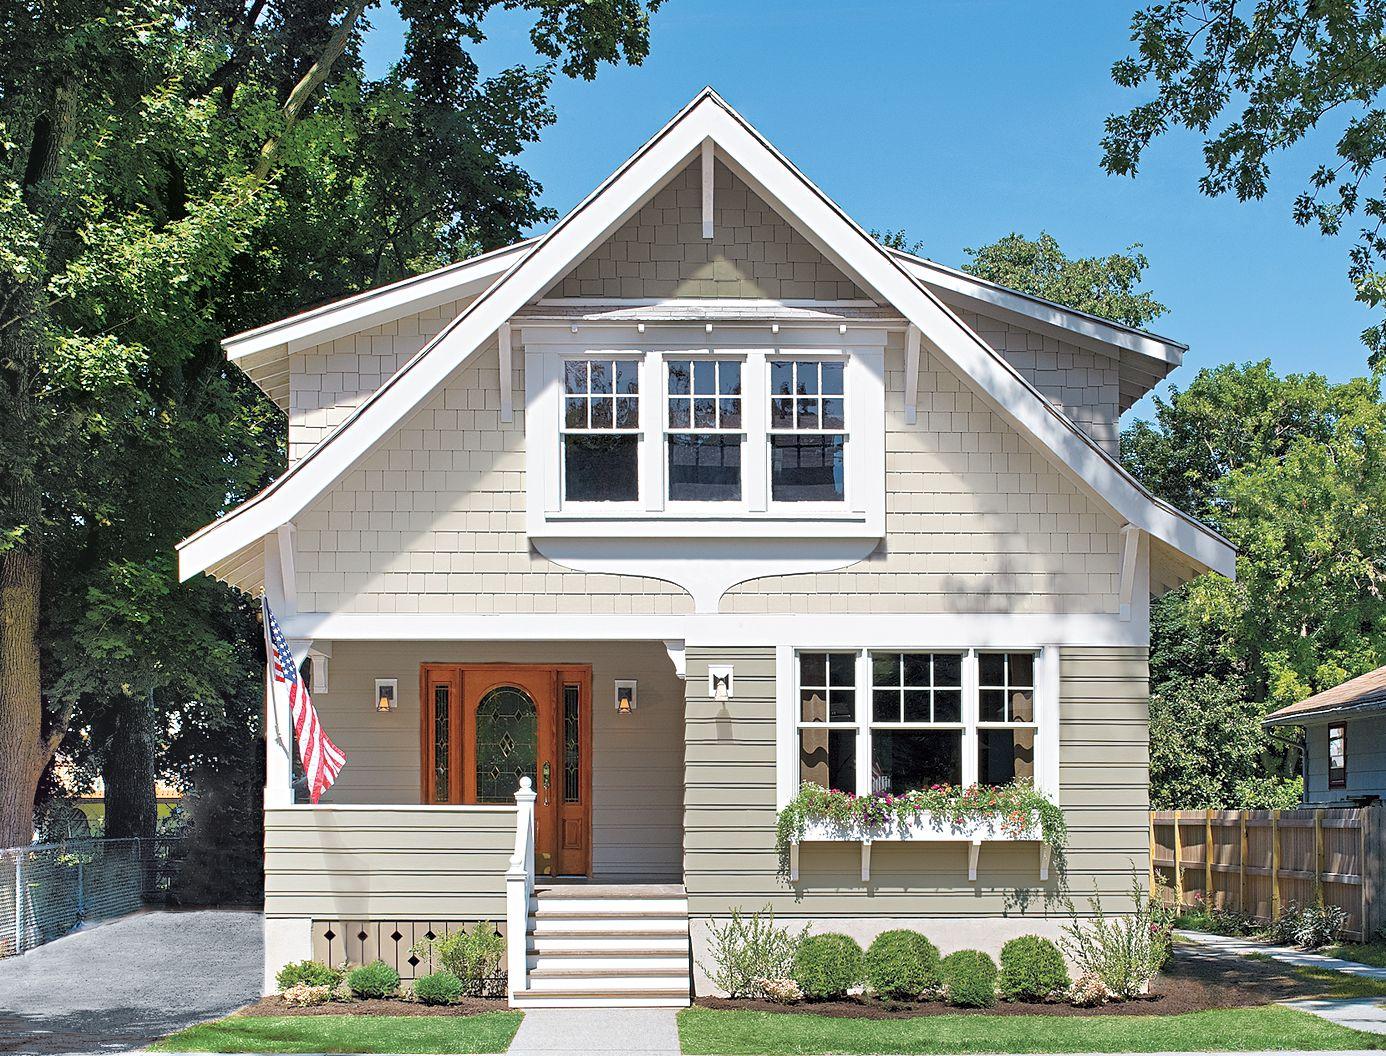 All About Fiber Cement Siding Exterior House Colors House Colors Craftsman Cottage